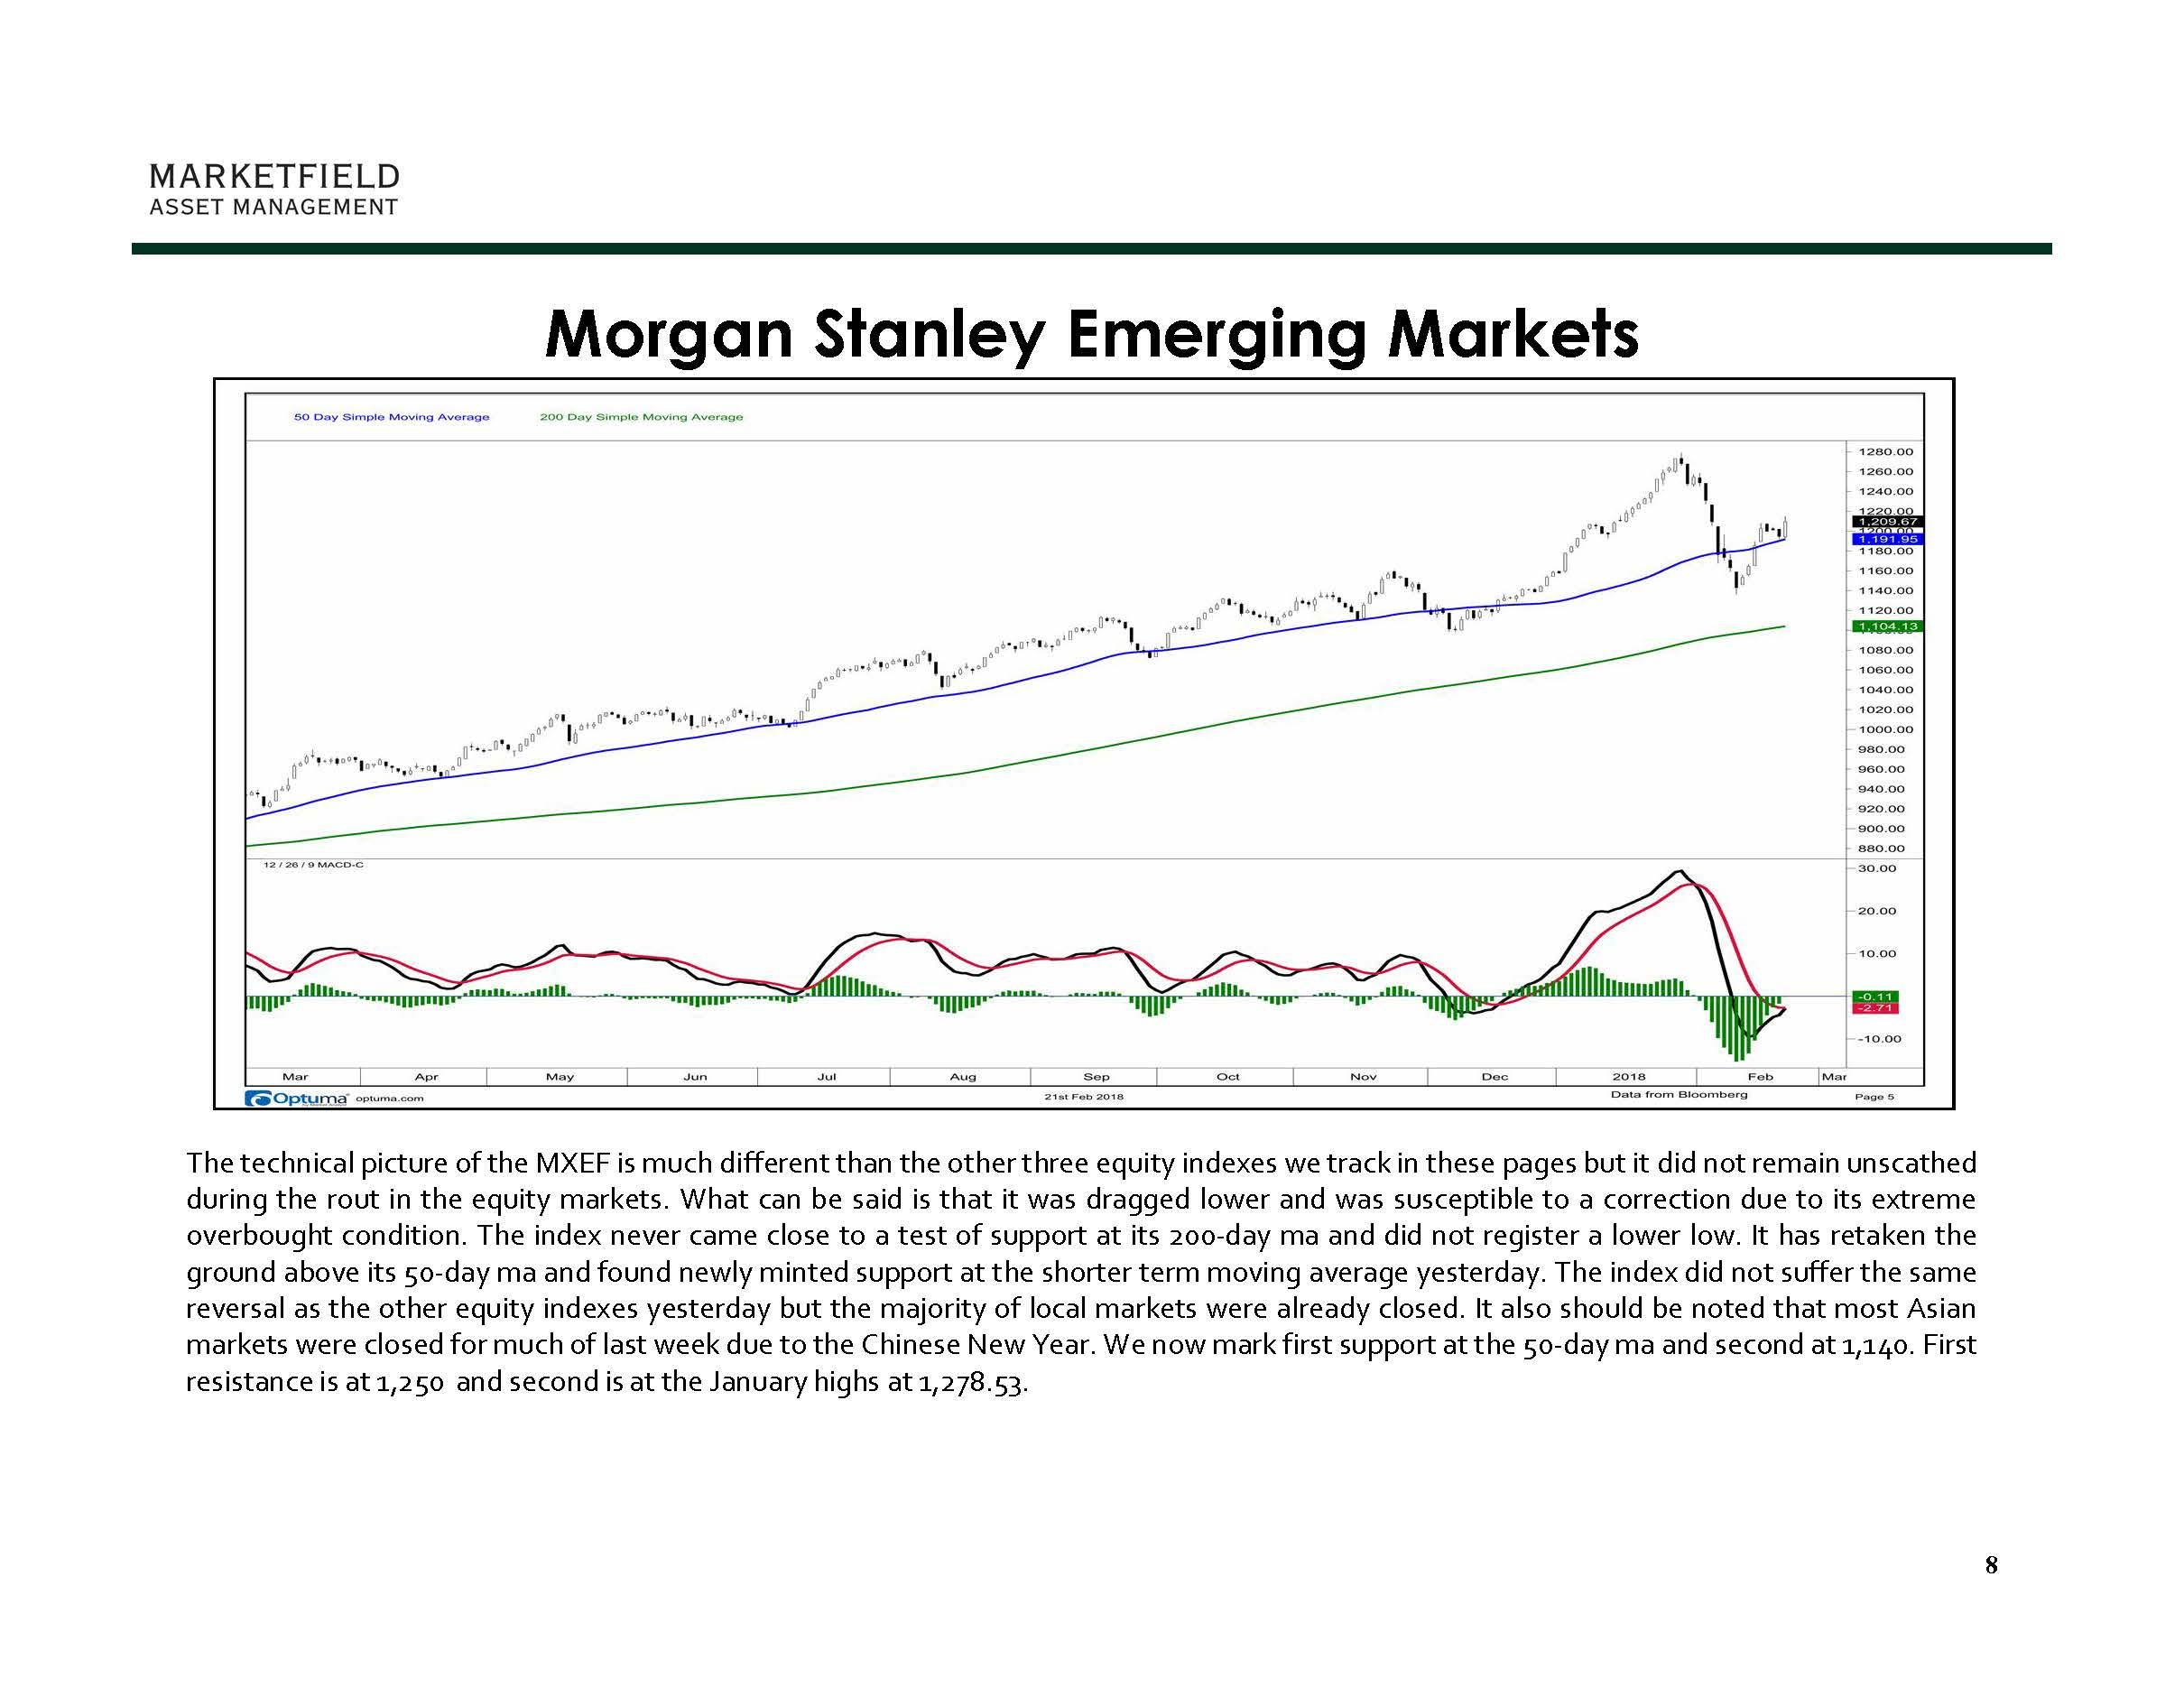 Marketfield Weekly Speculator 02-22-18_Page_08.jpg